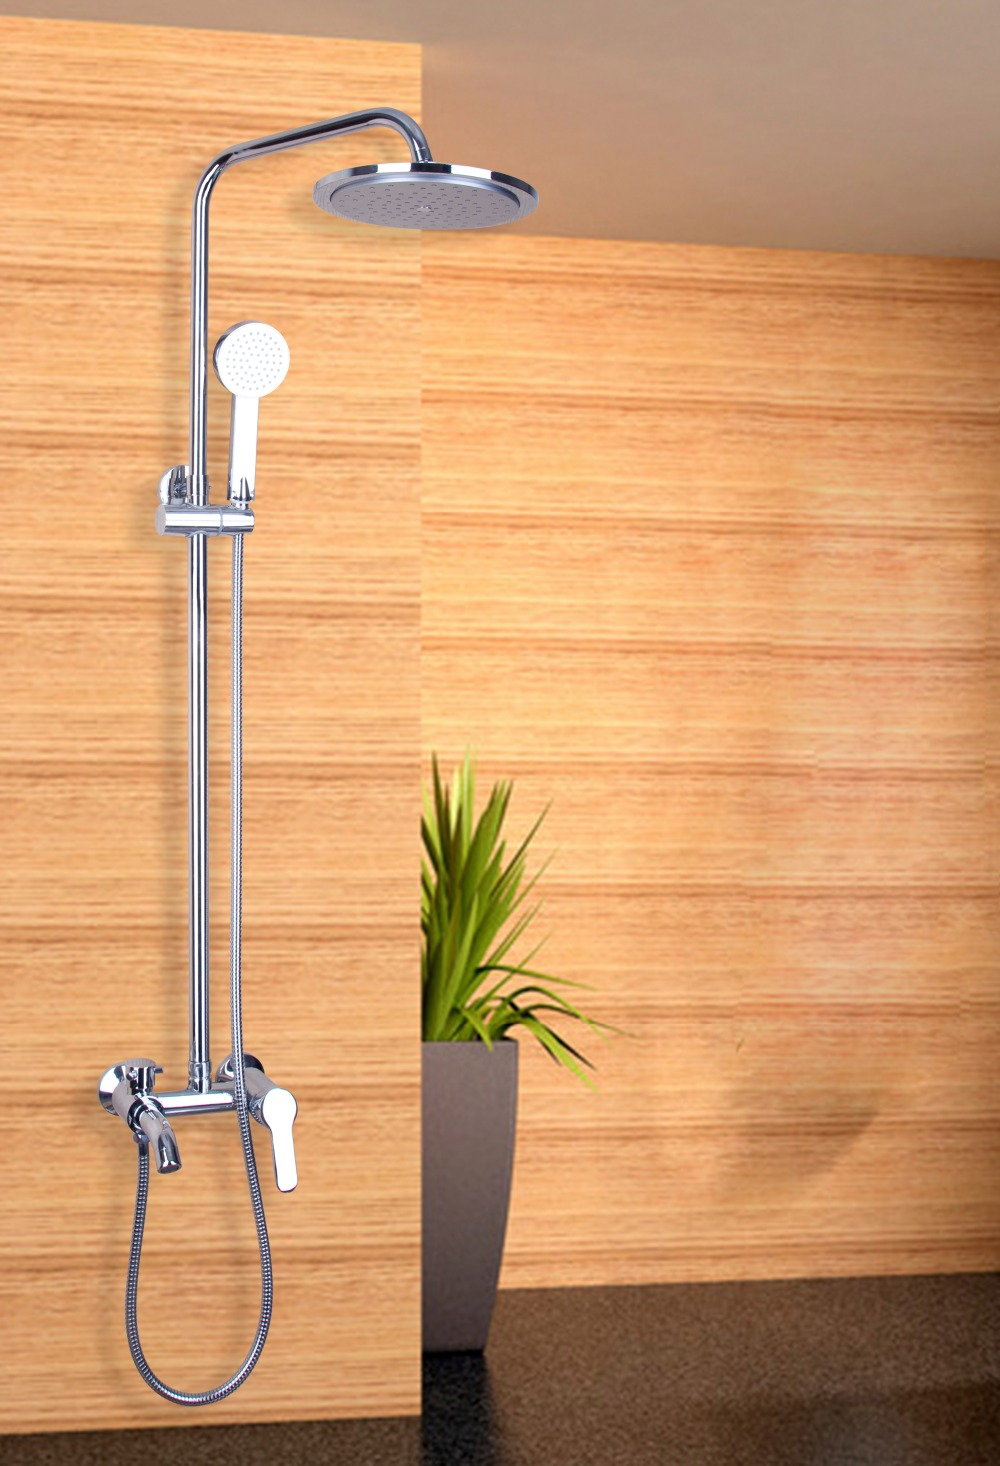 Torayvino Chrome Polished Waterfall Rain Shower Faucet & Hand Shower Wall Mounted Single Handle Bathroom Faucet Mixer Tap torayvino tap bathroom shower faucet with chrome polished cold